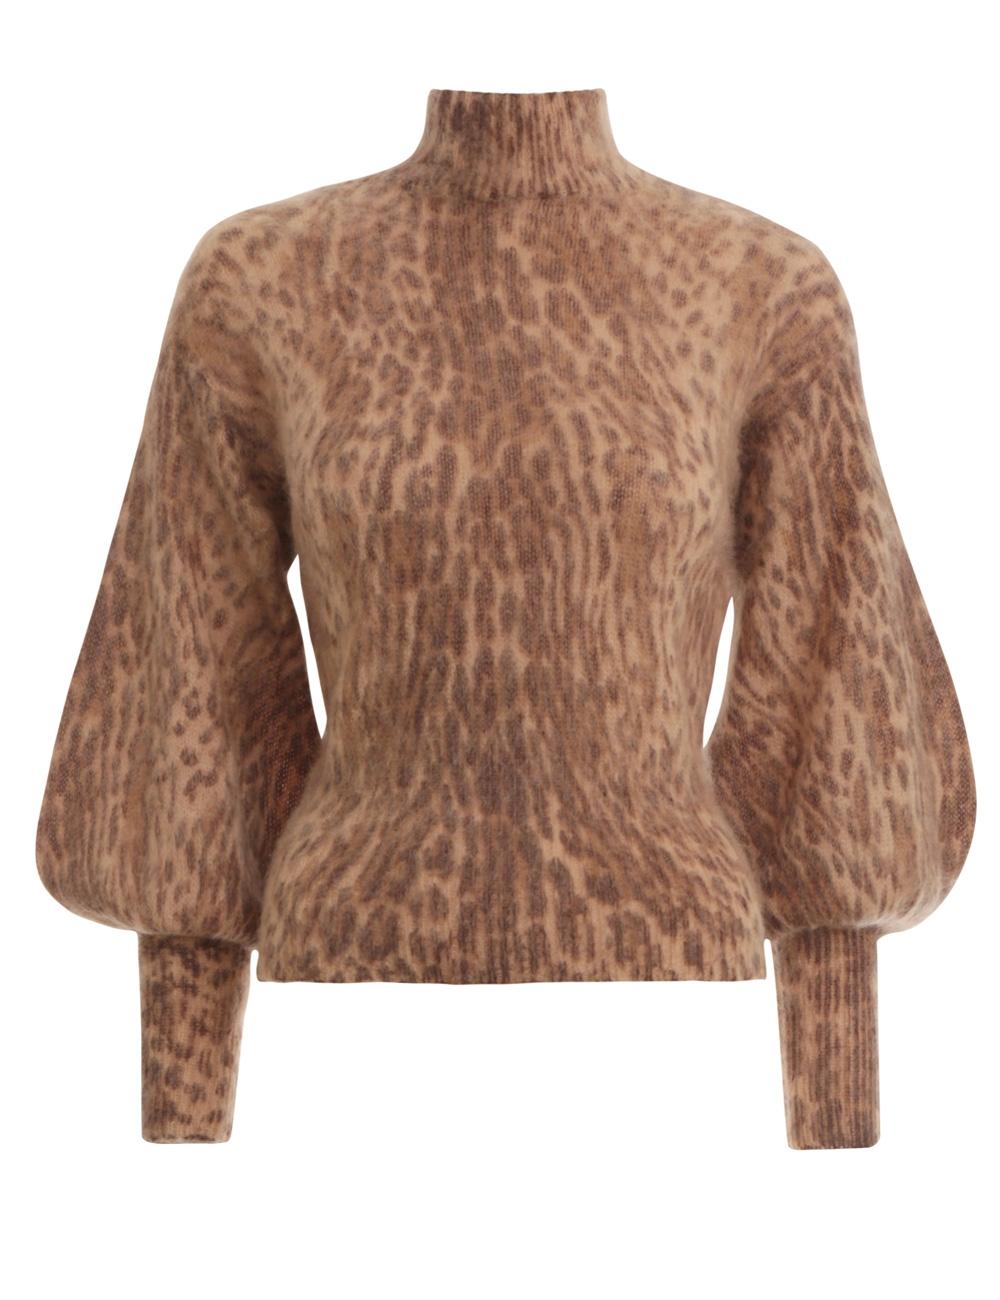 Espionage Bell Sweater